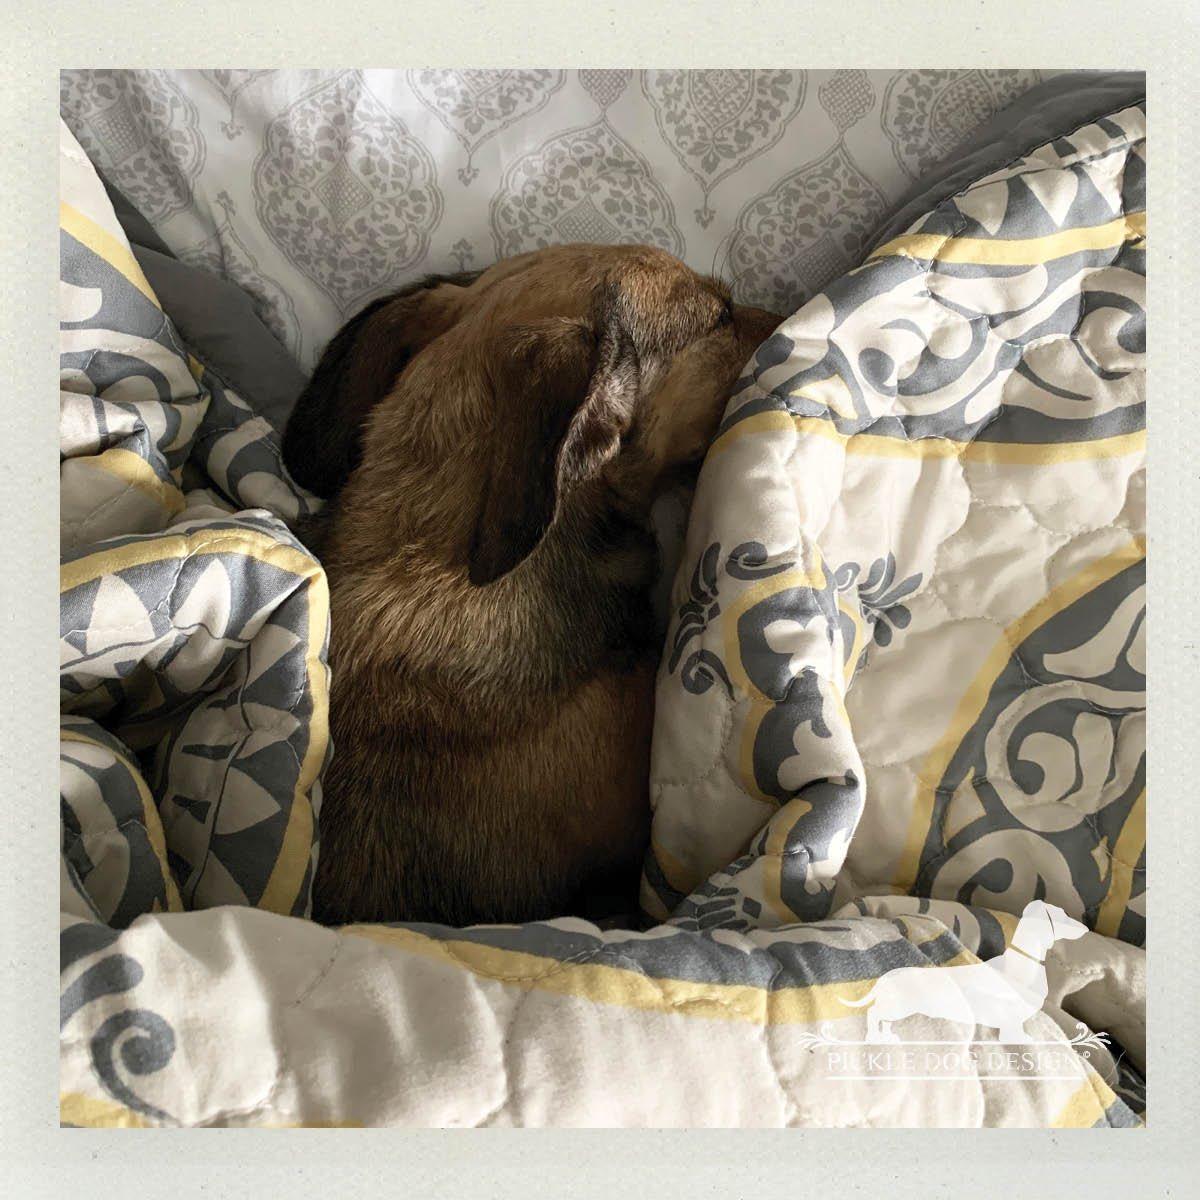 """It's been a long week."" Says we in the middle of Tuesday. #tuesdaymood #tuesdayfeeling #tuckedin #snuggledup #napping #dognap #letsleepingdogslie #sleepydogs #tiredpup #dachshund #doxie #doglife #dachshundoftheday #etsyseller #etsyshop #smallbiz #smallbusiness #shopsmallpic.twitter.com/baioRQrctQ"